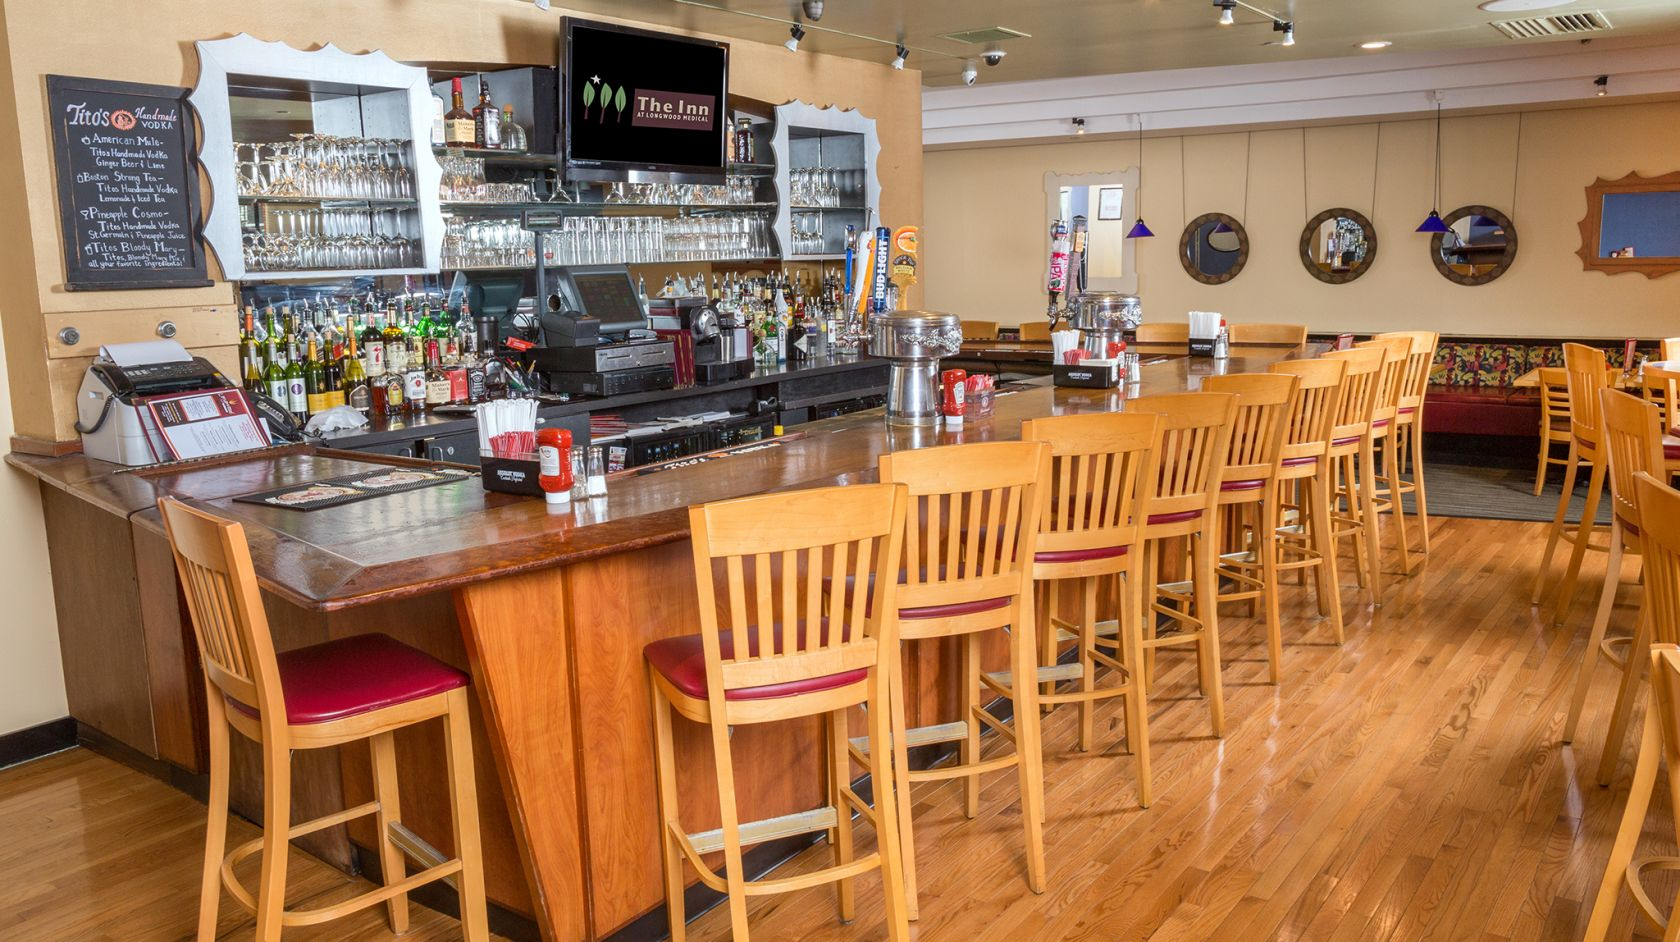 The Inn at Longwood Medical image 2